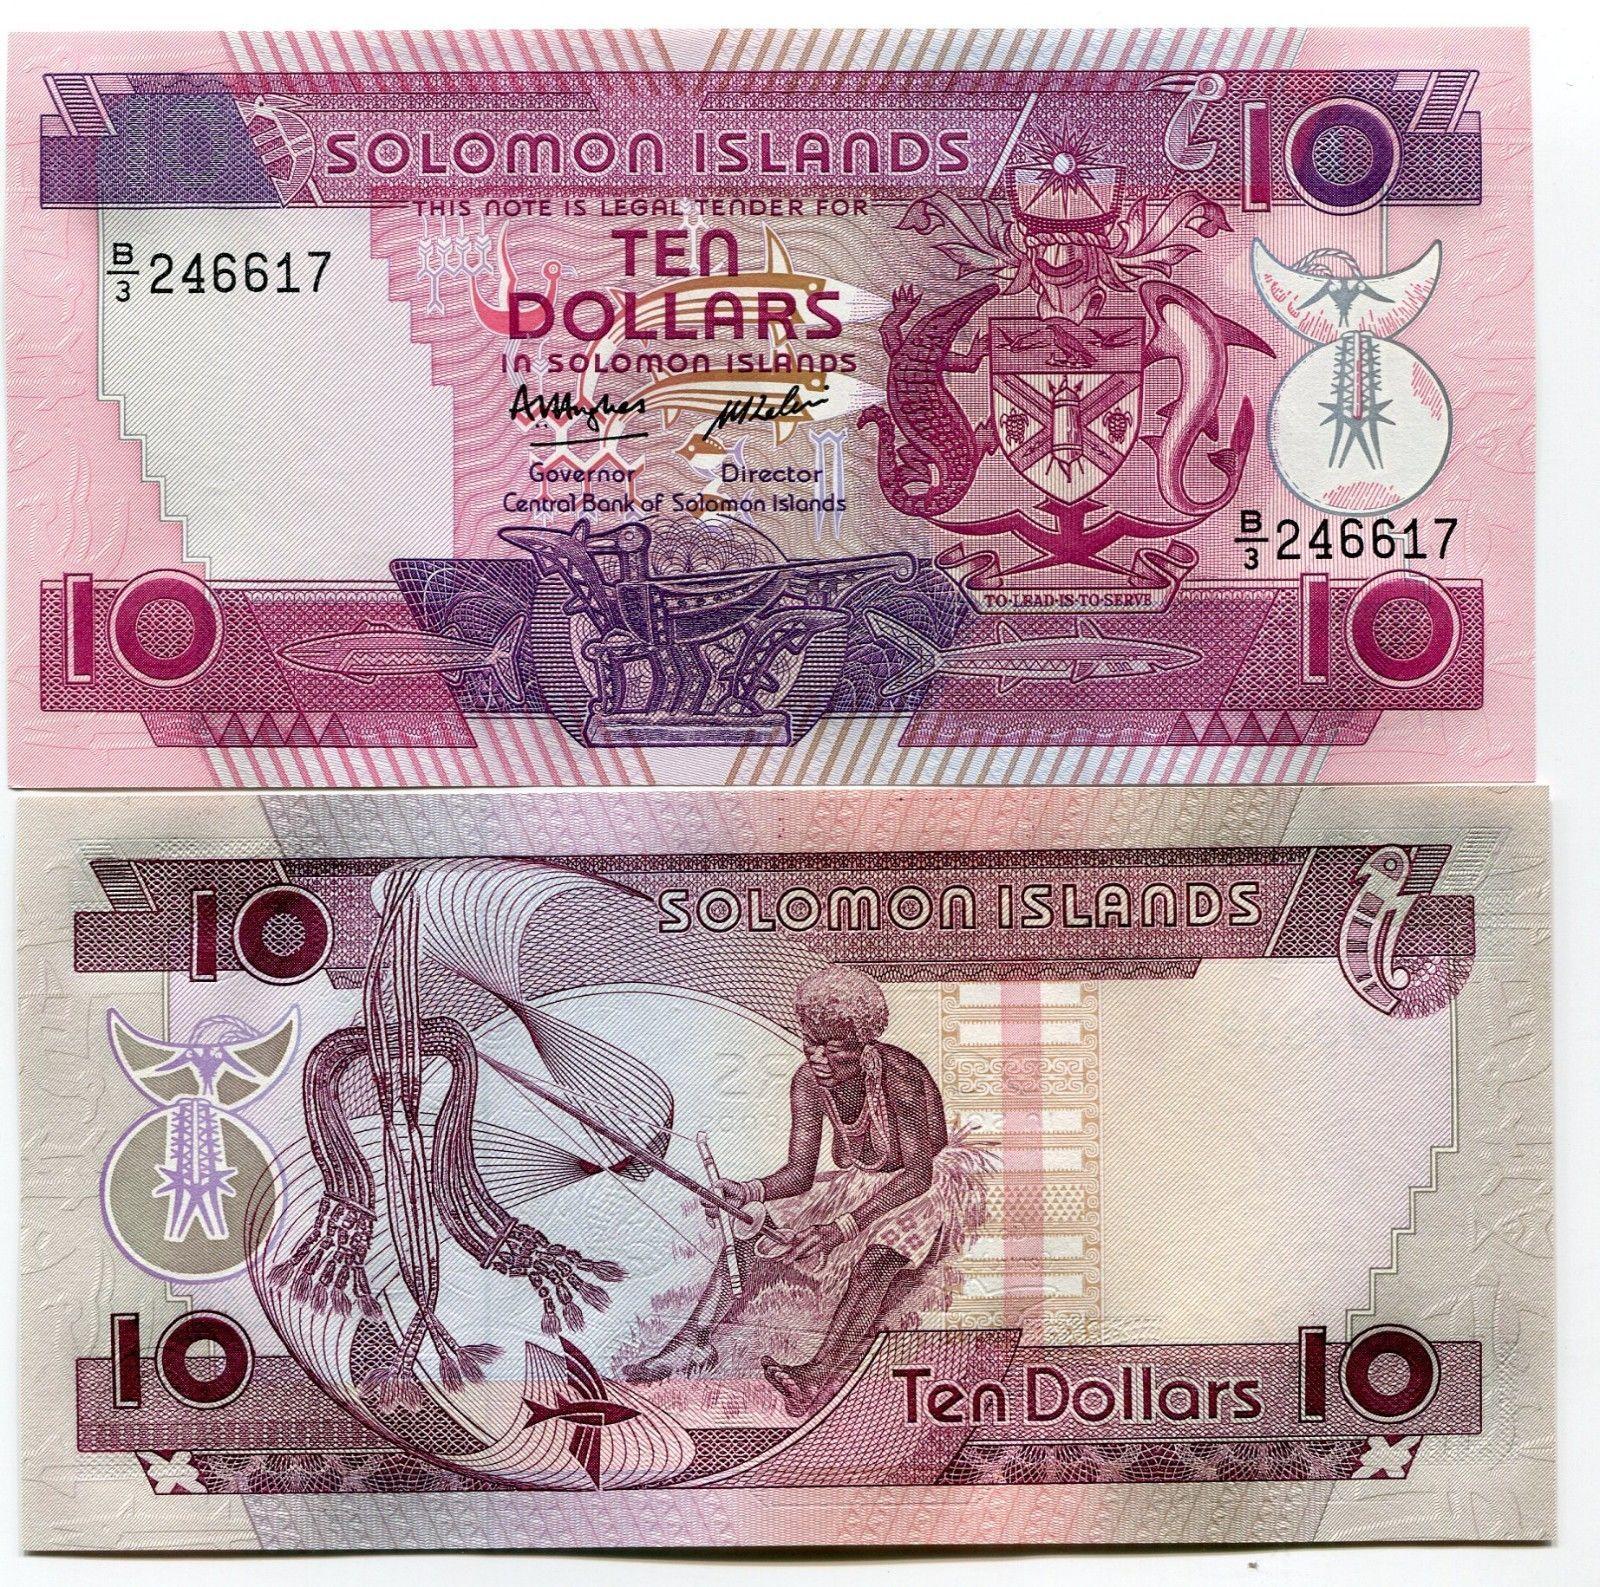 1998 SINGAPORE 2 DOLLARS P-37 UNC LOT 10 PCS/> /> /> /> /> /> /> /> /> /> /> /> />BA BANKNOTE